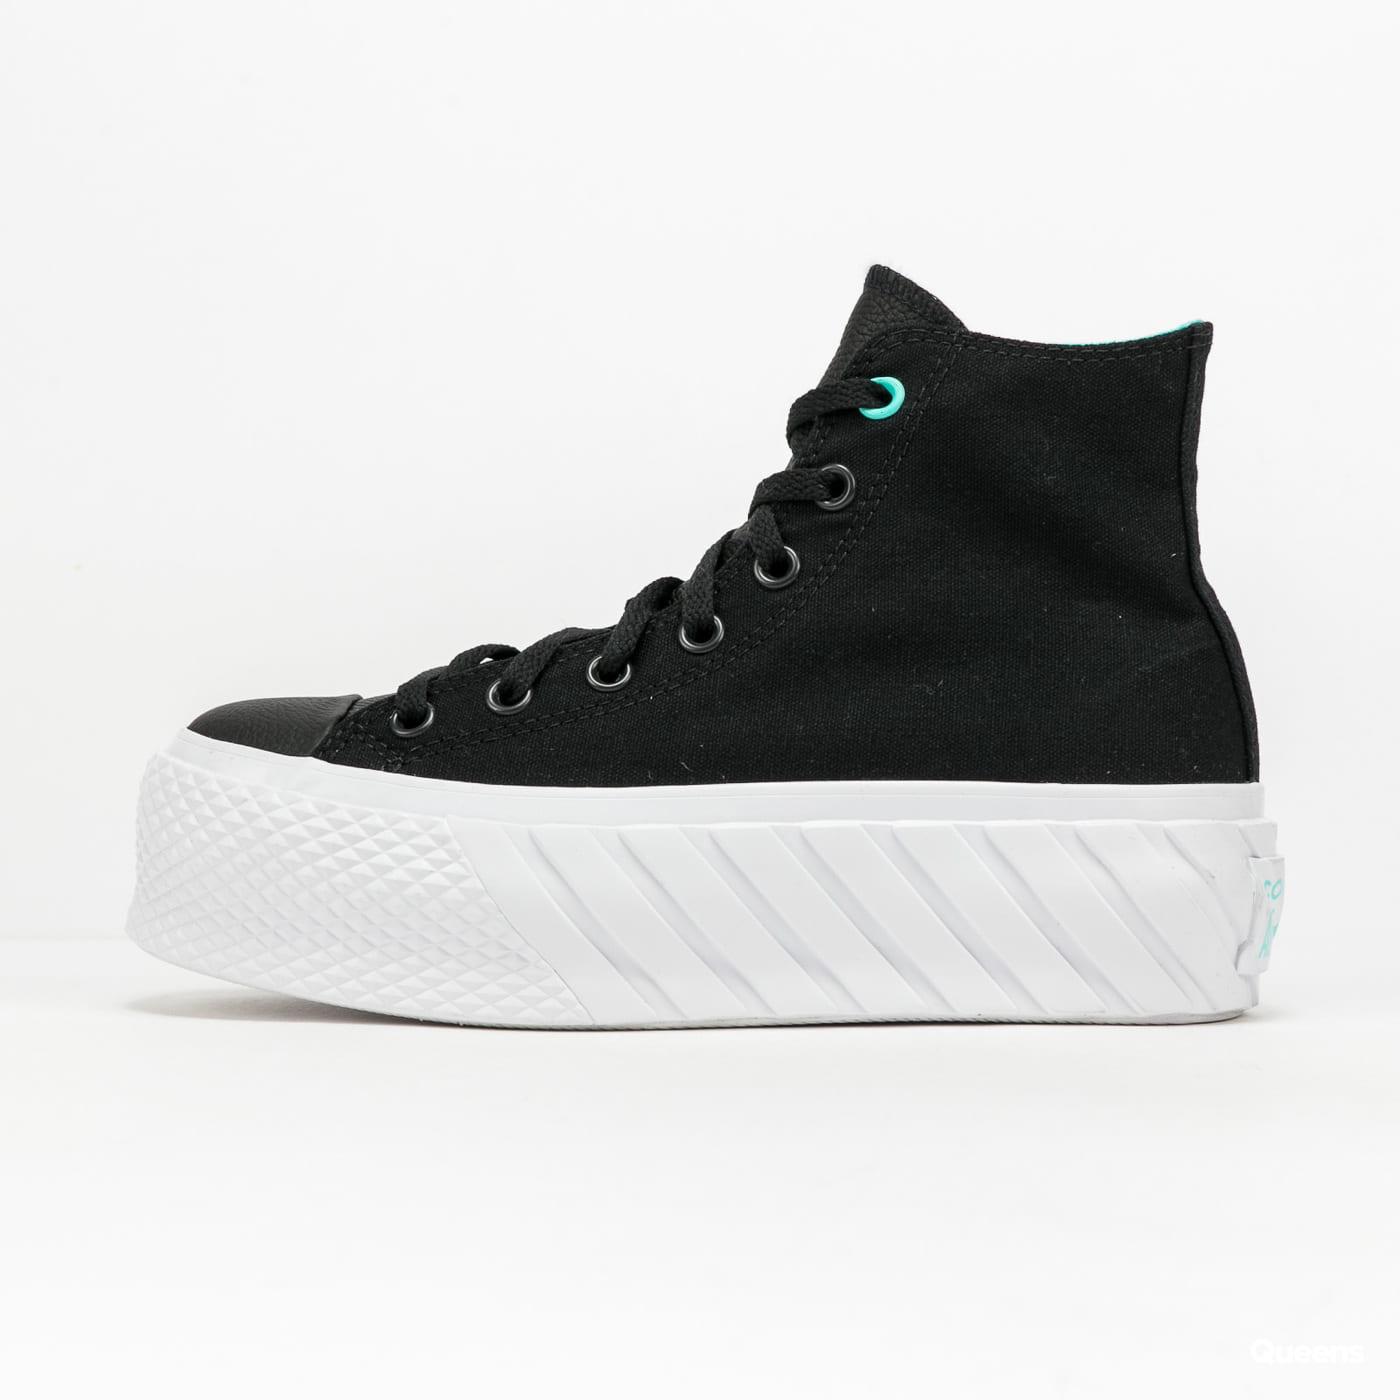 Converse Chuck Taylor All Star Lift 2X Hi black / electric aqua / white